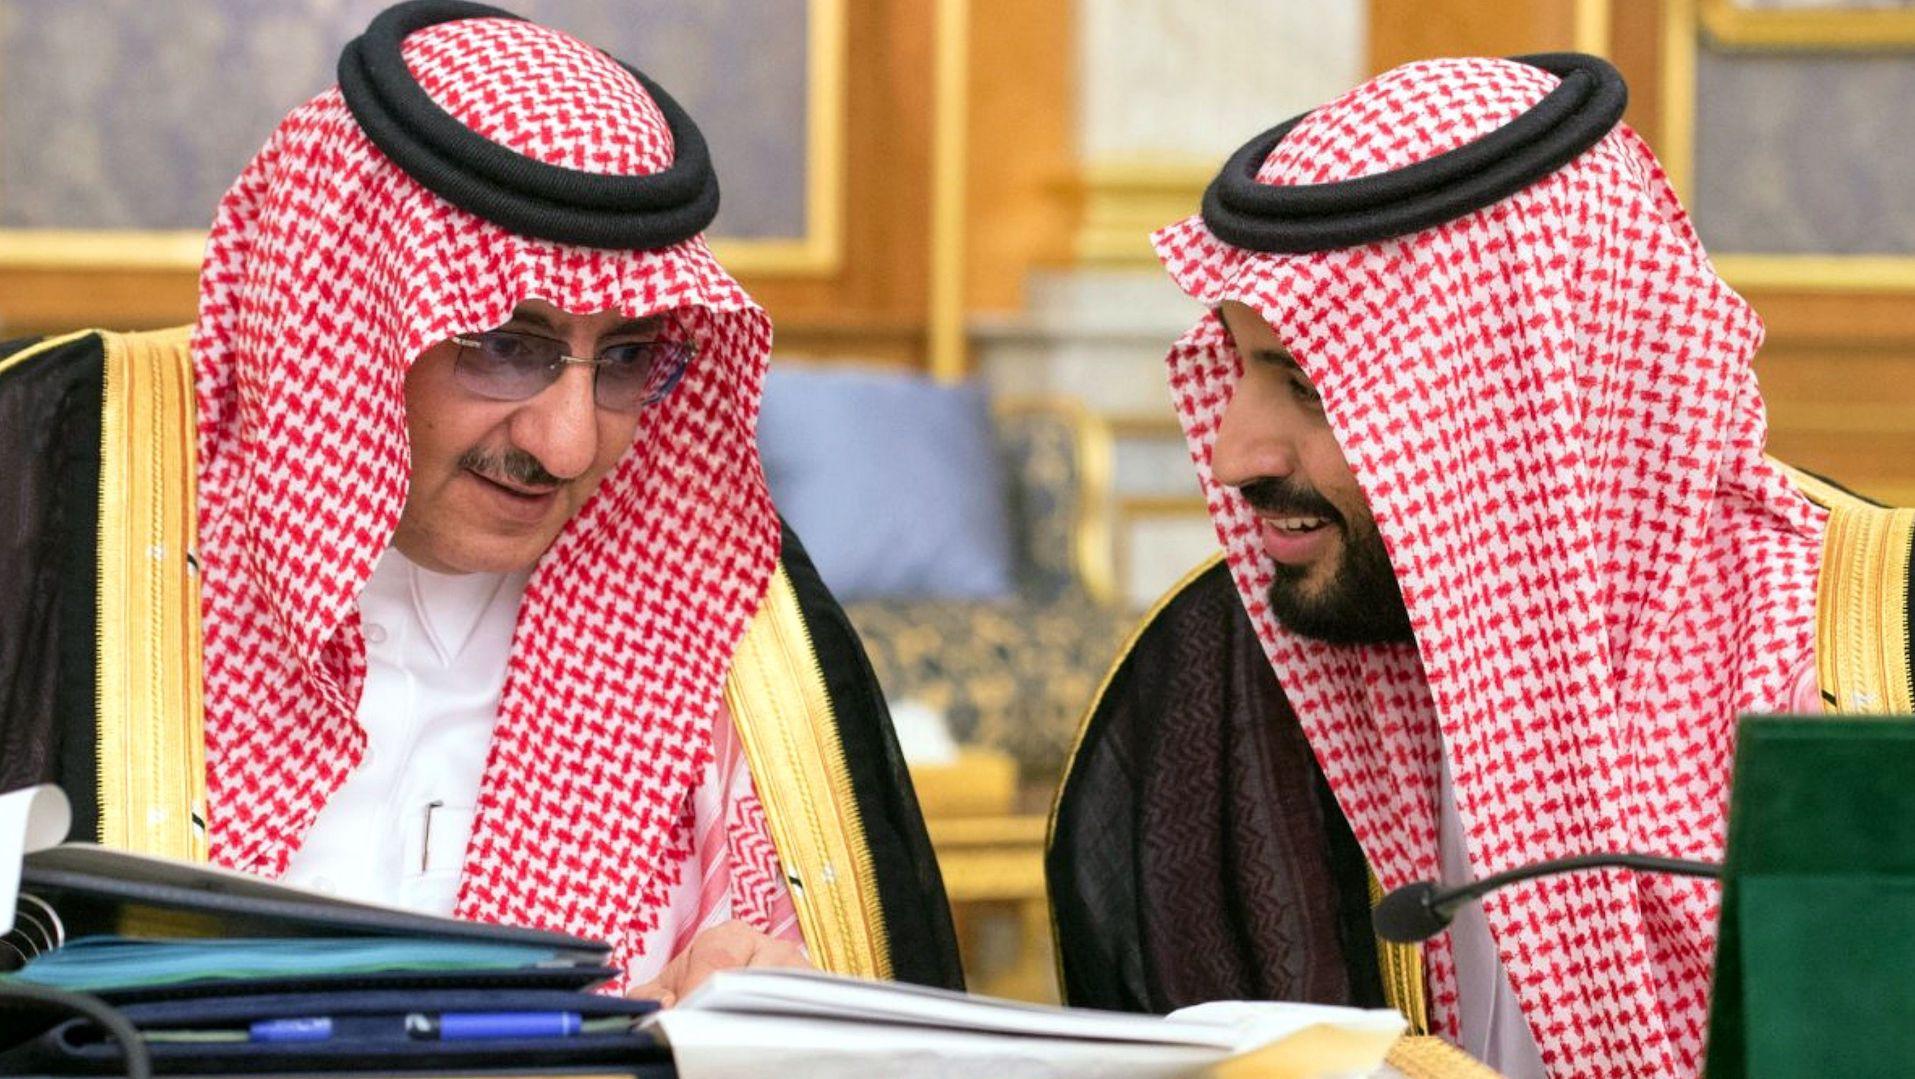 Saudi king names son as new crown prince, upending the royal succession